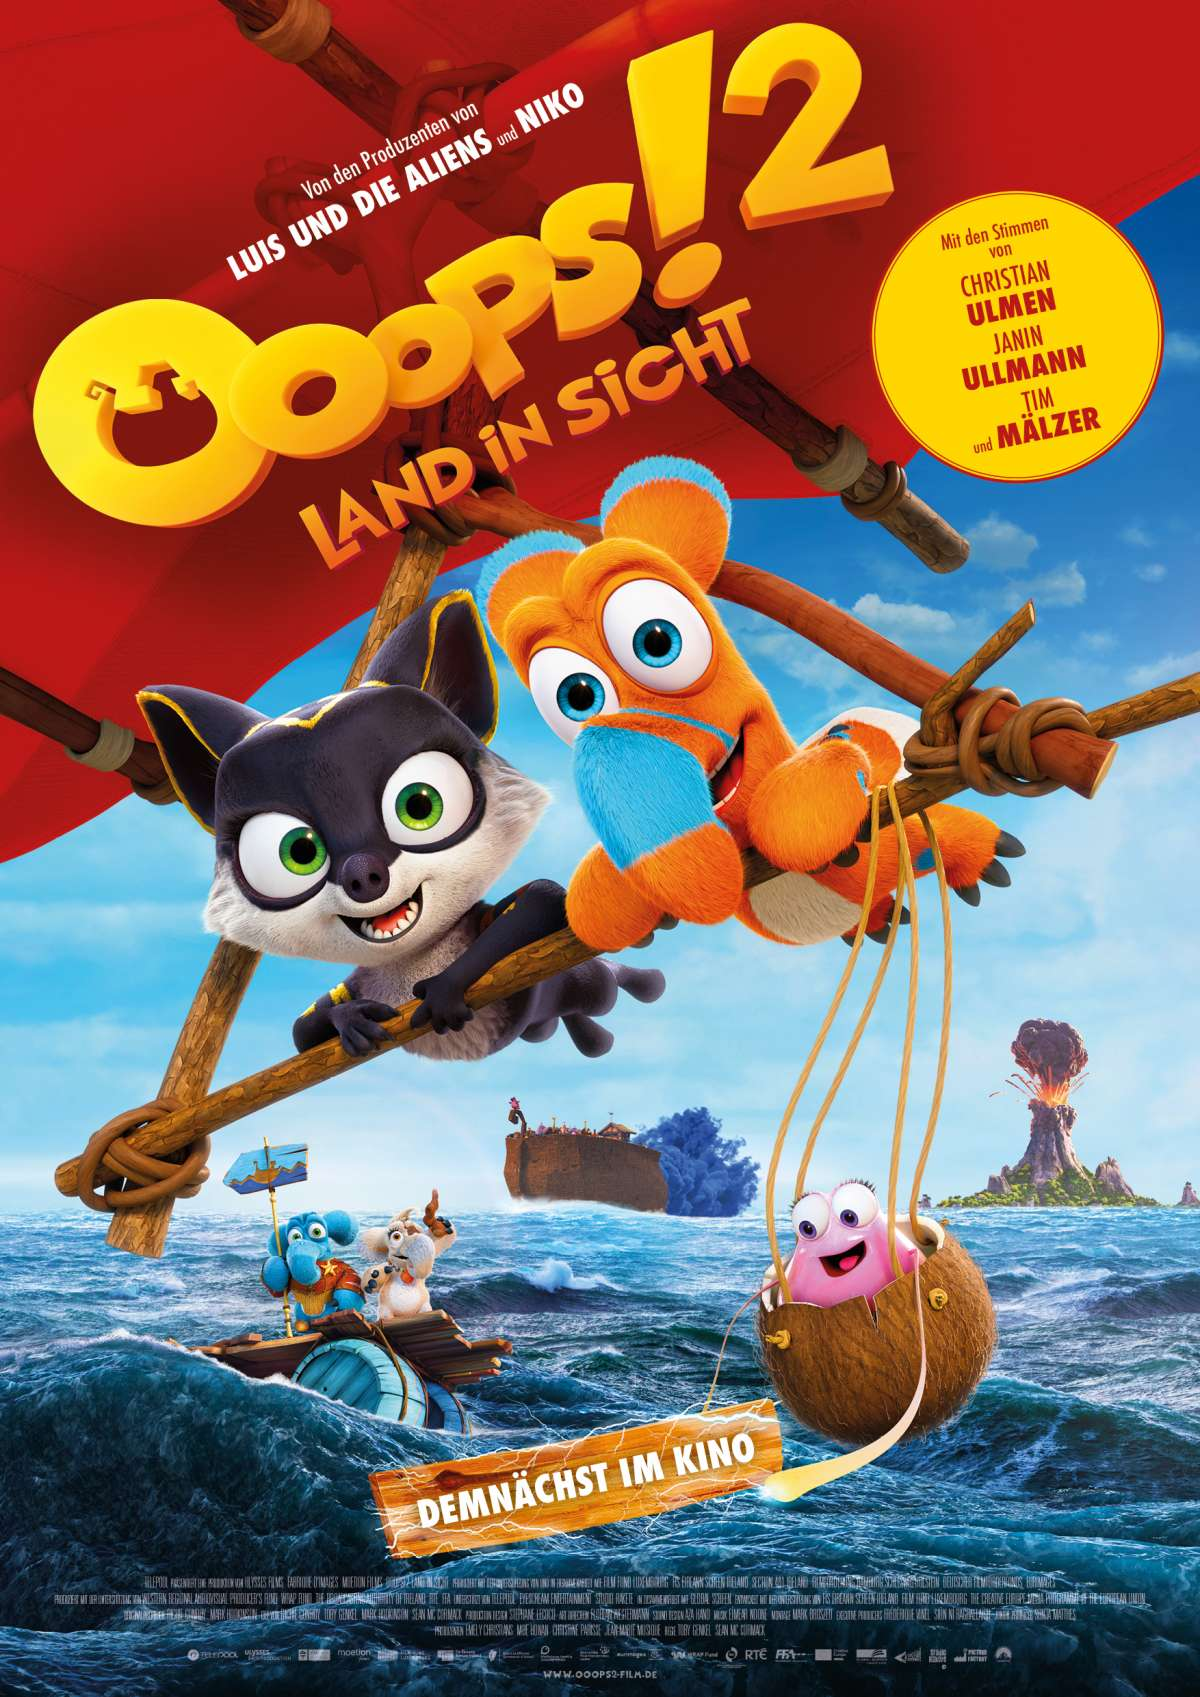 Ooops! 2 - Land in Sicht - CineK-Kino  - Korbach